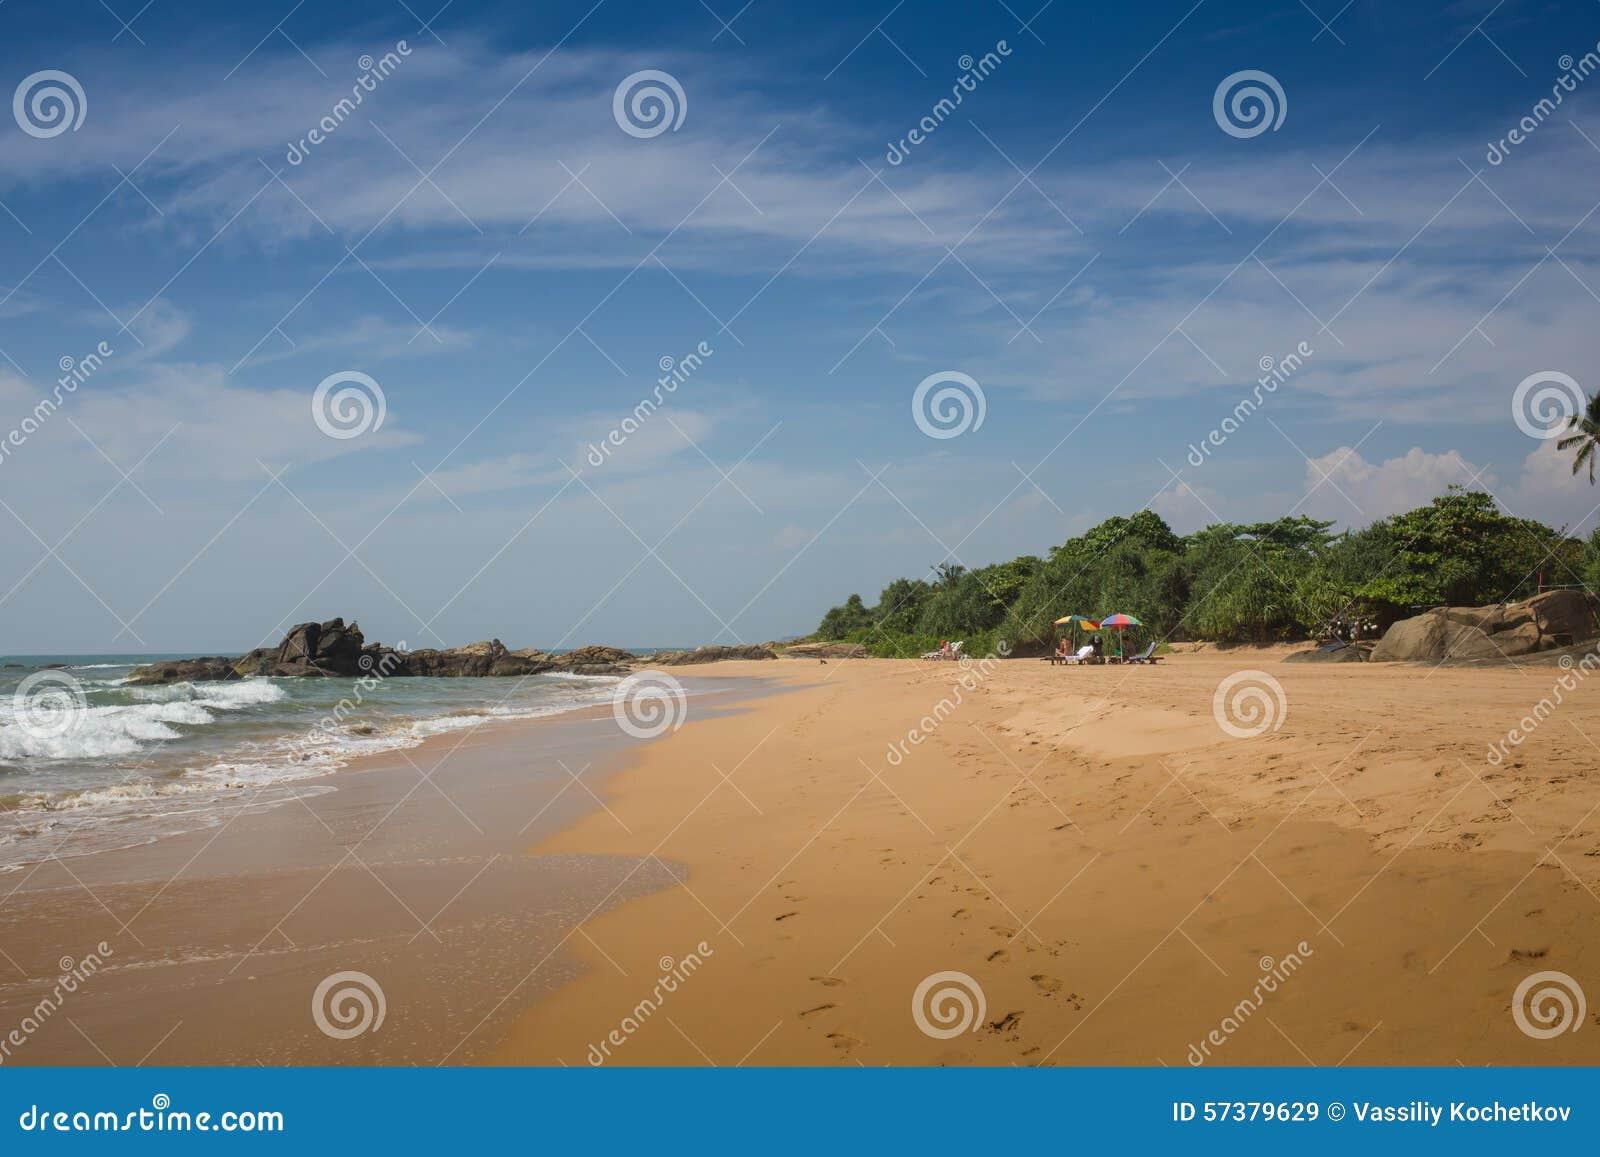 Overzeese zandhemel en de zomerdag